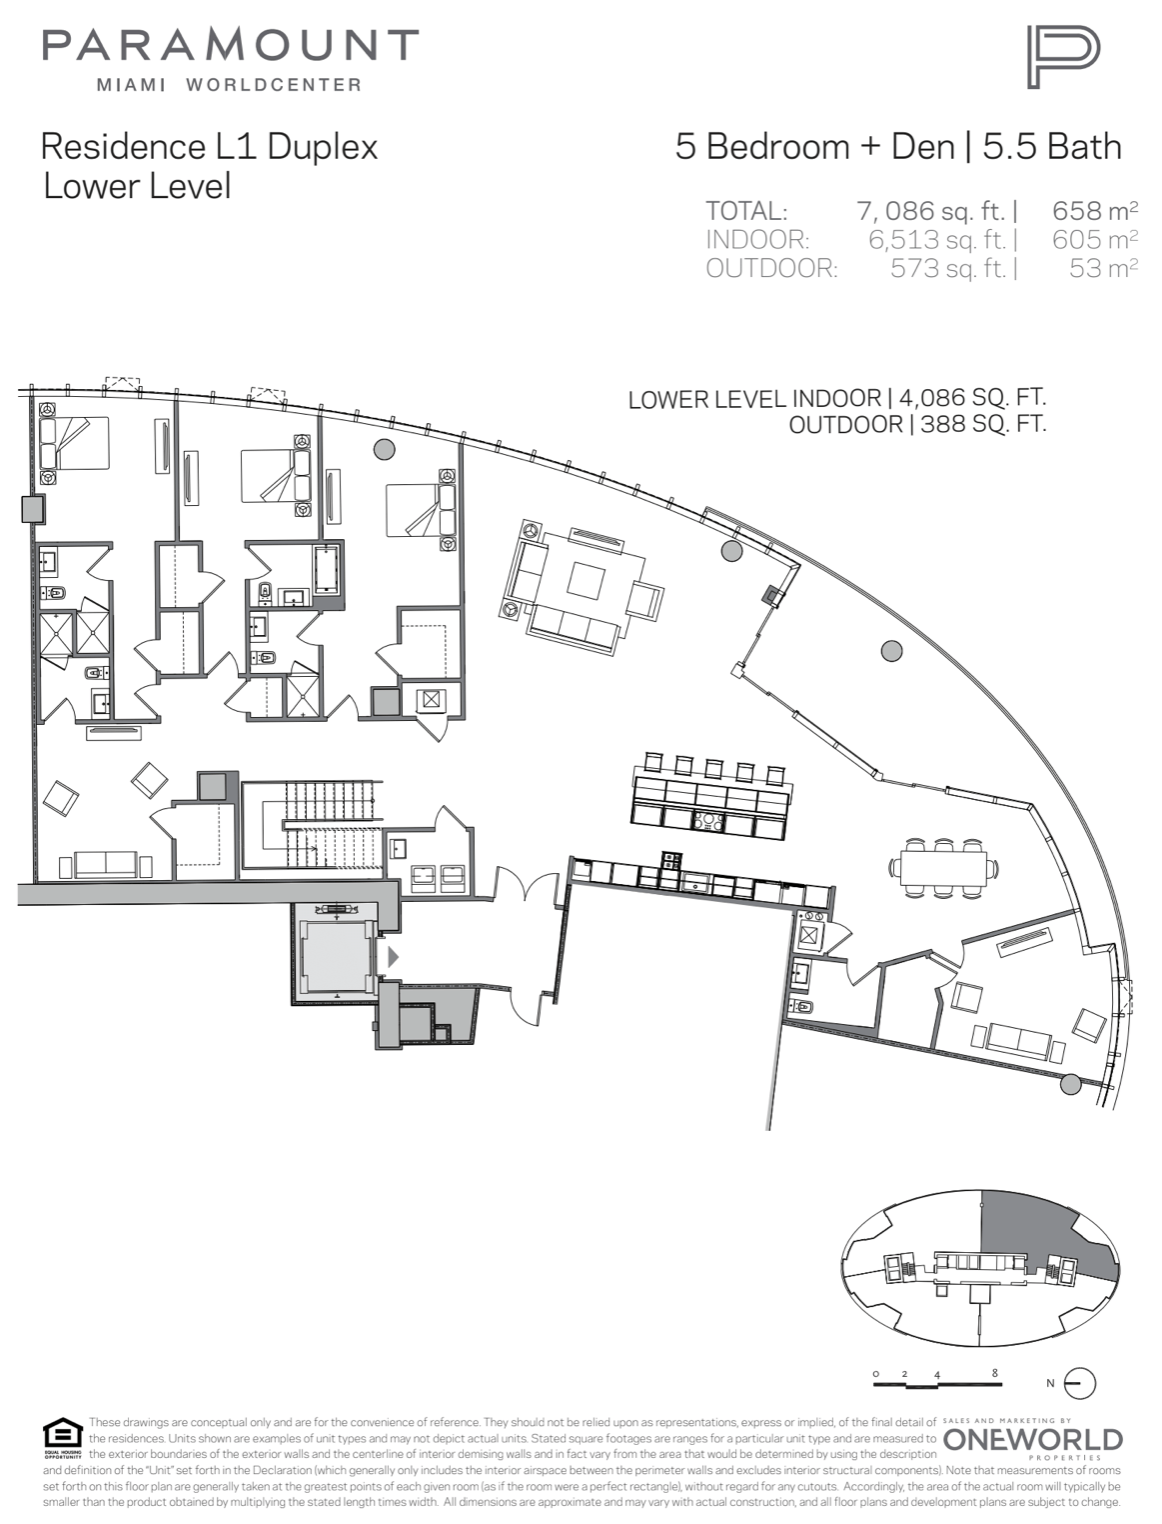 PMWC Penthouse L1 Lower Level